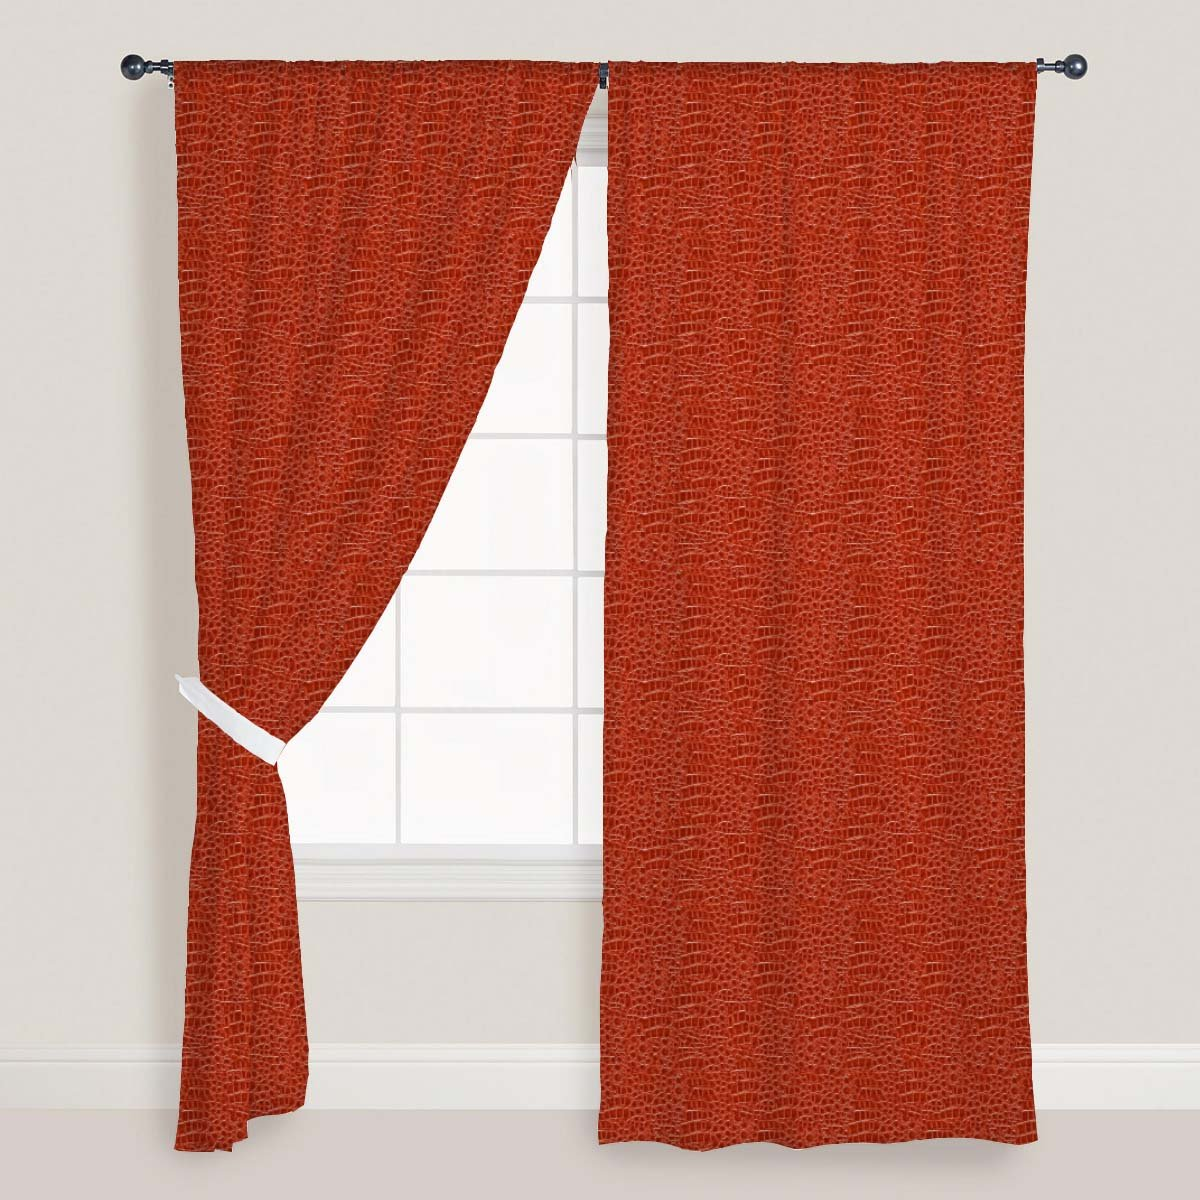 AZ Crocodile Hide Door & Window Curtain Satin 4feet x 7feet; SET OF 3 PCS